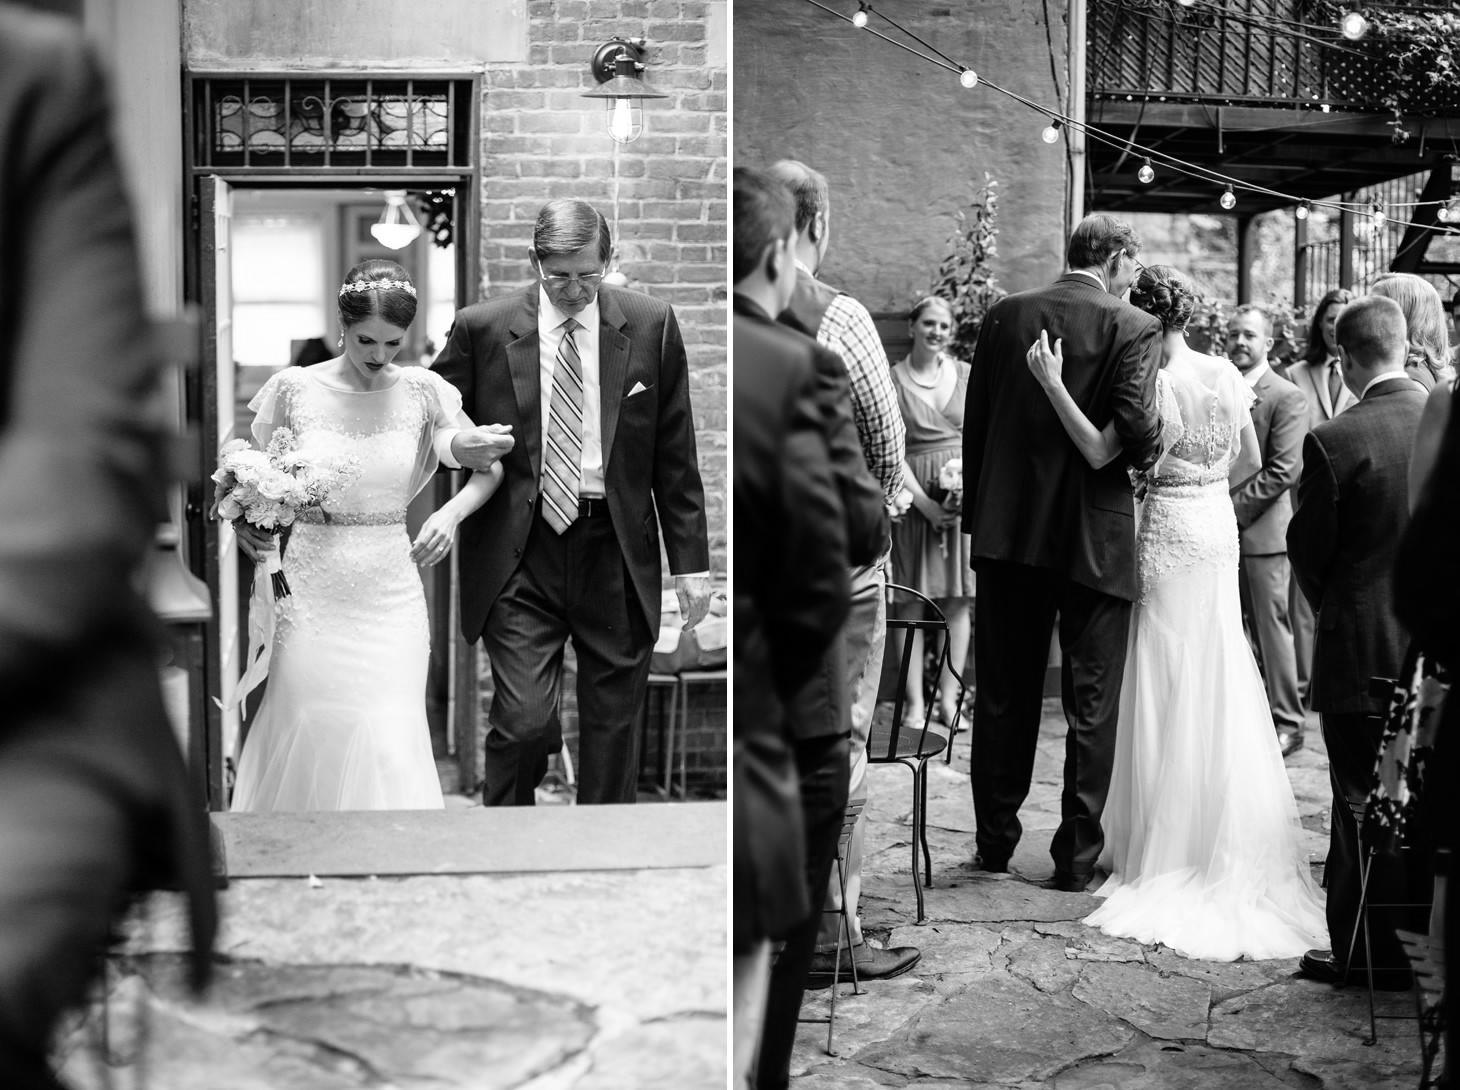 020-nyc-wedding-photographer-brooklyn-restaurant-2.jpg